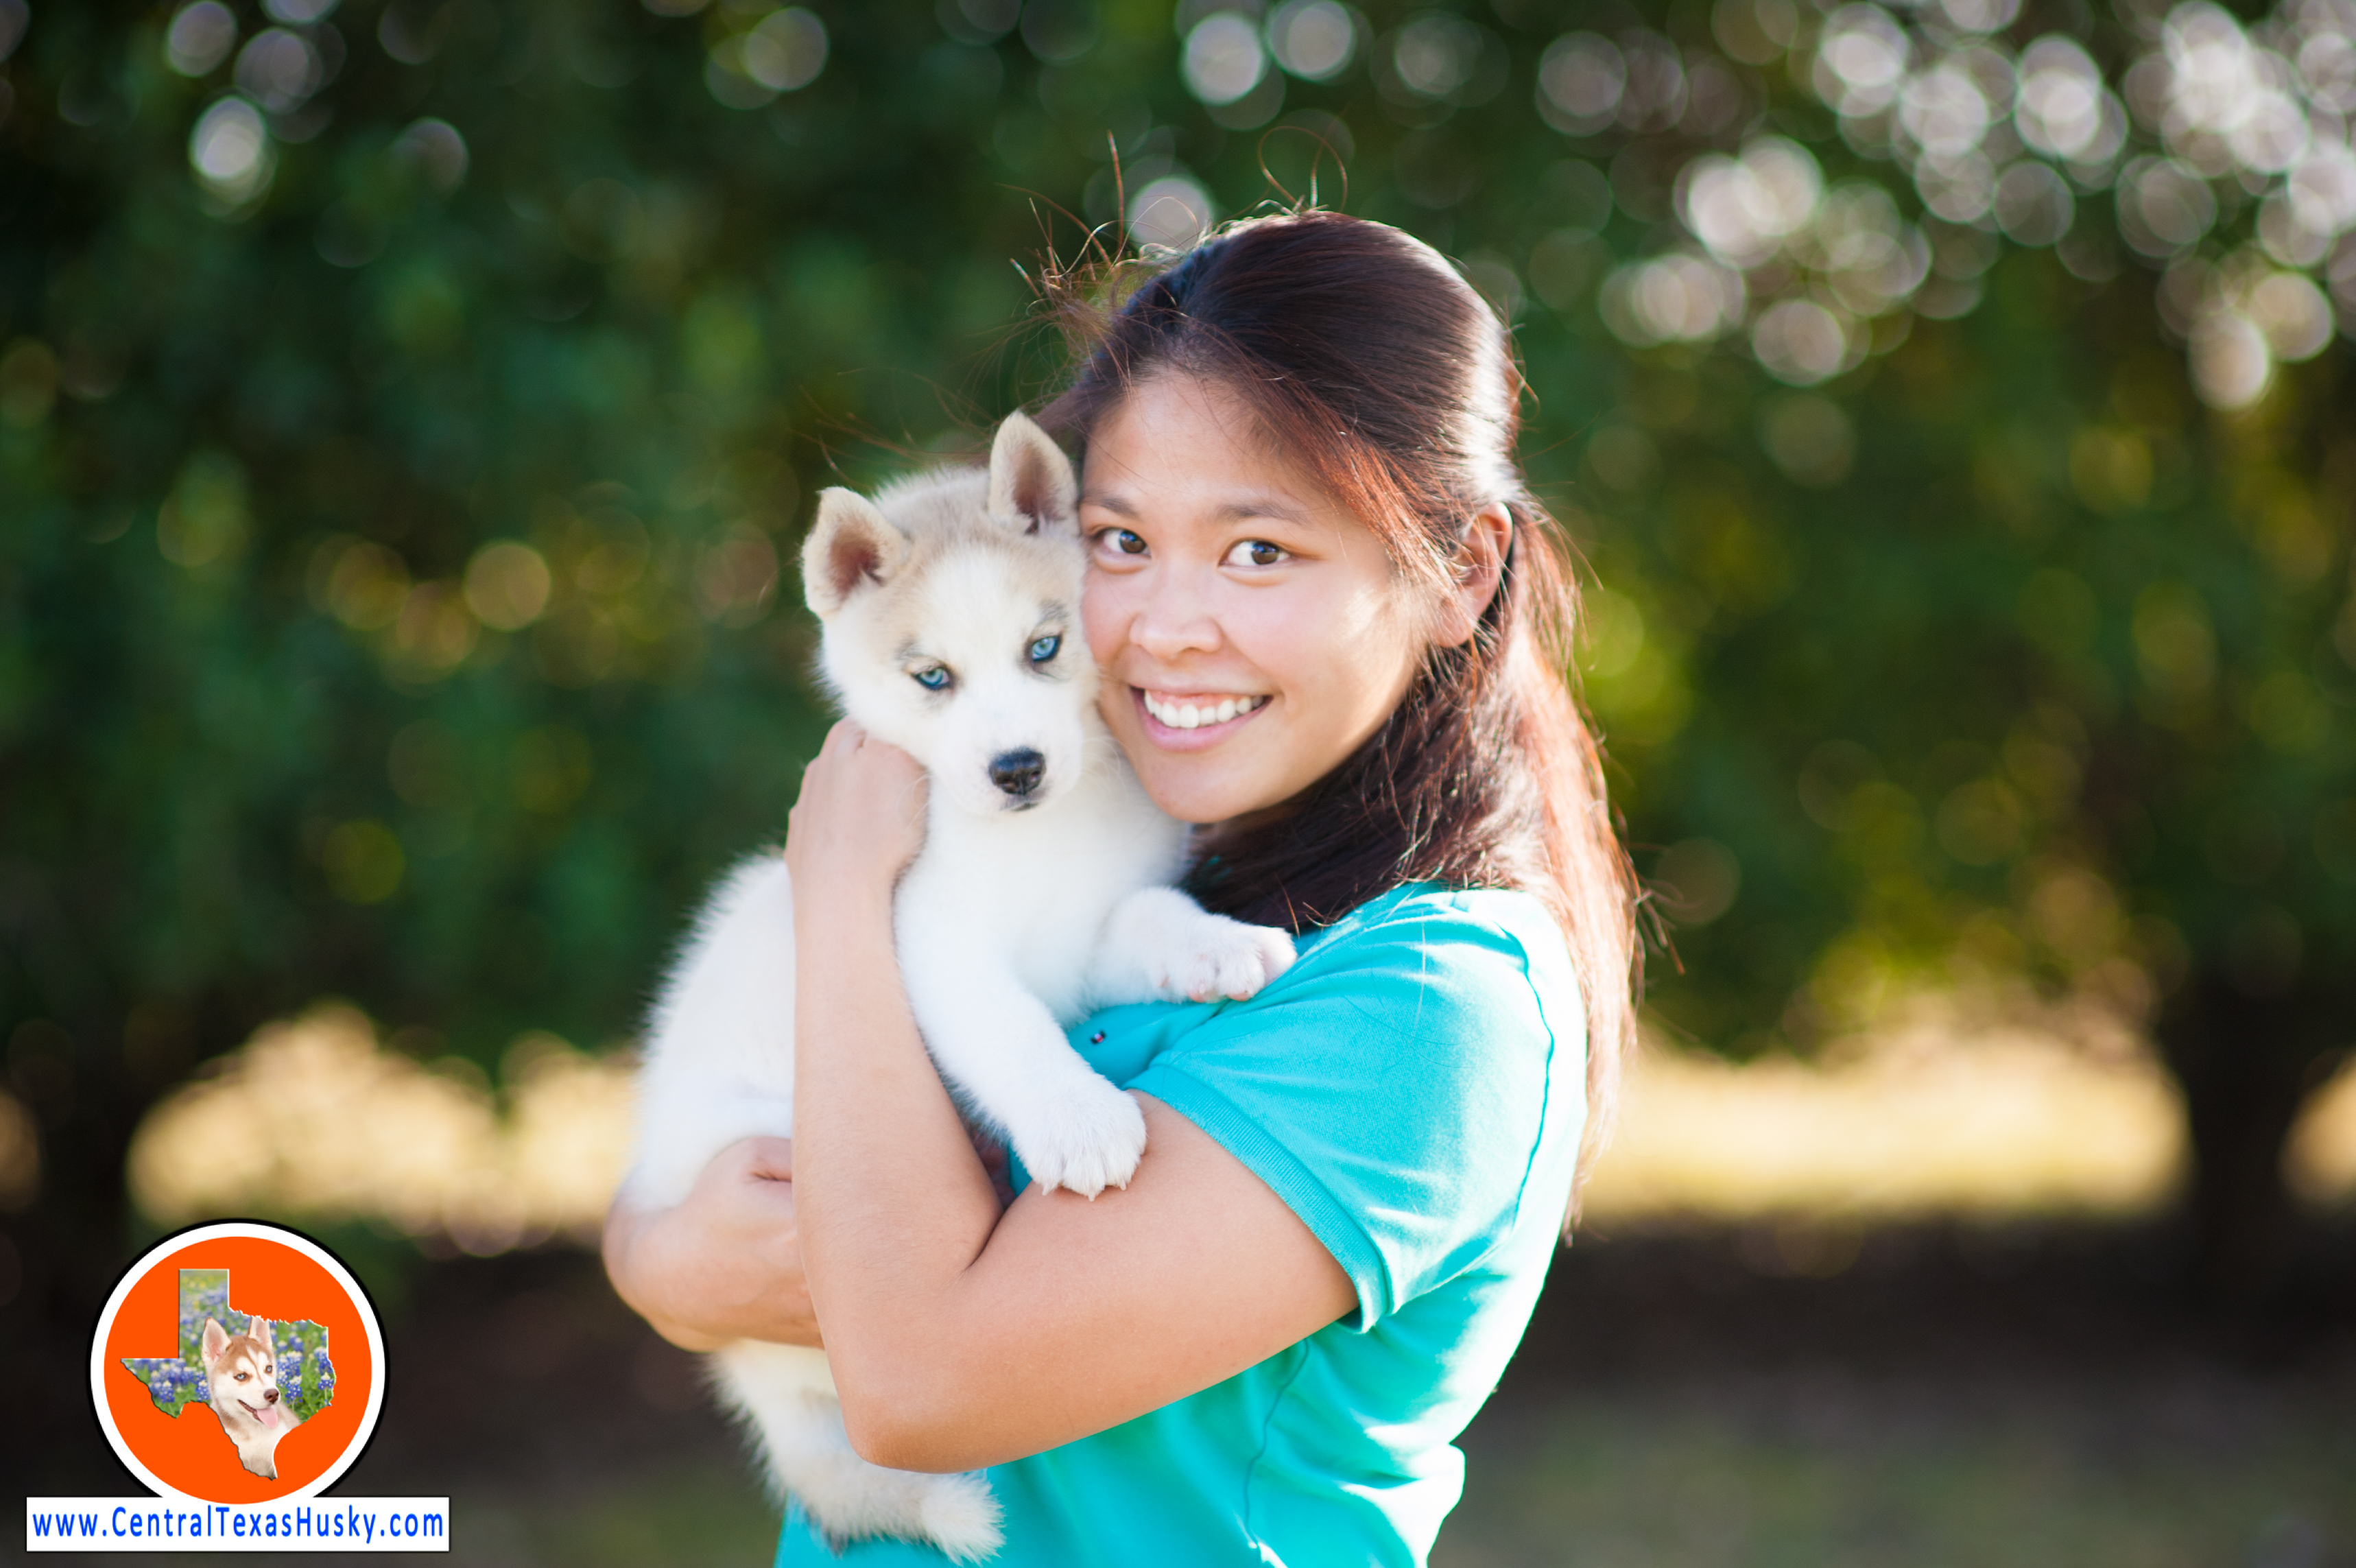 central-texas-husky_austin-siberian-husky-breeder_702531_20171102